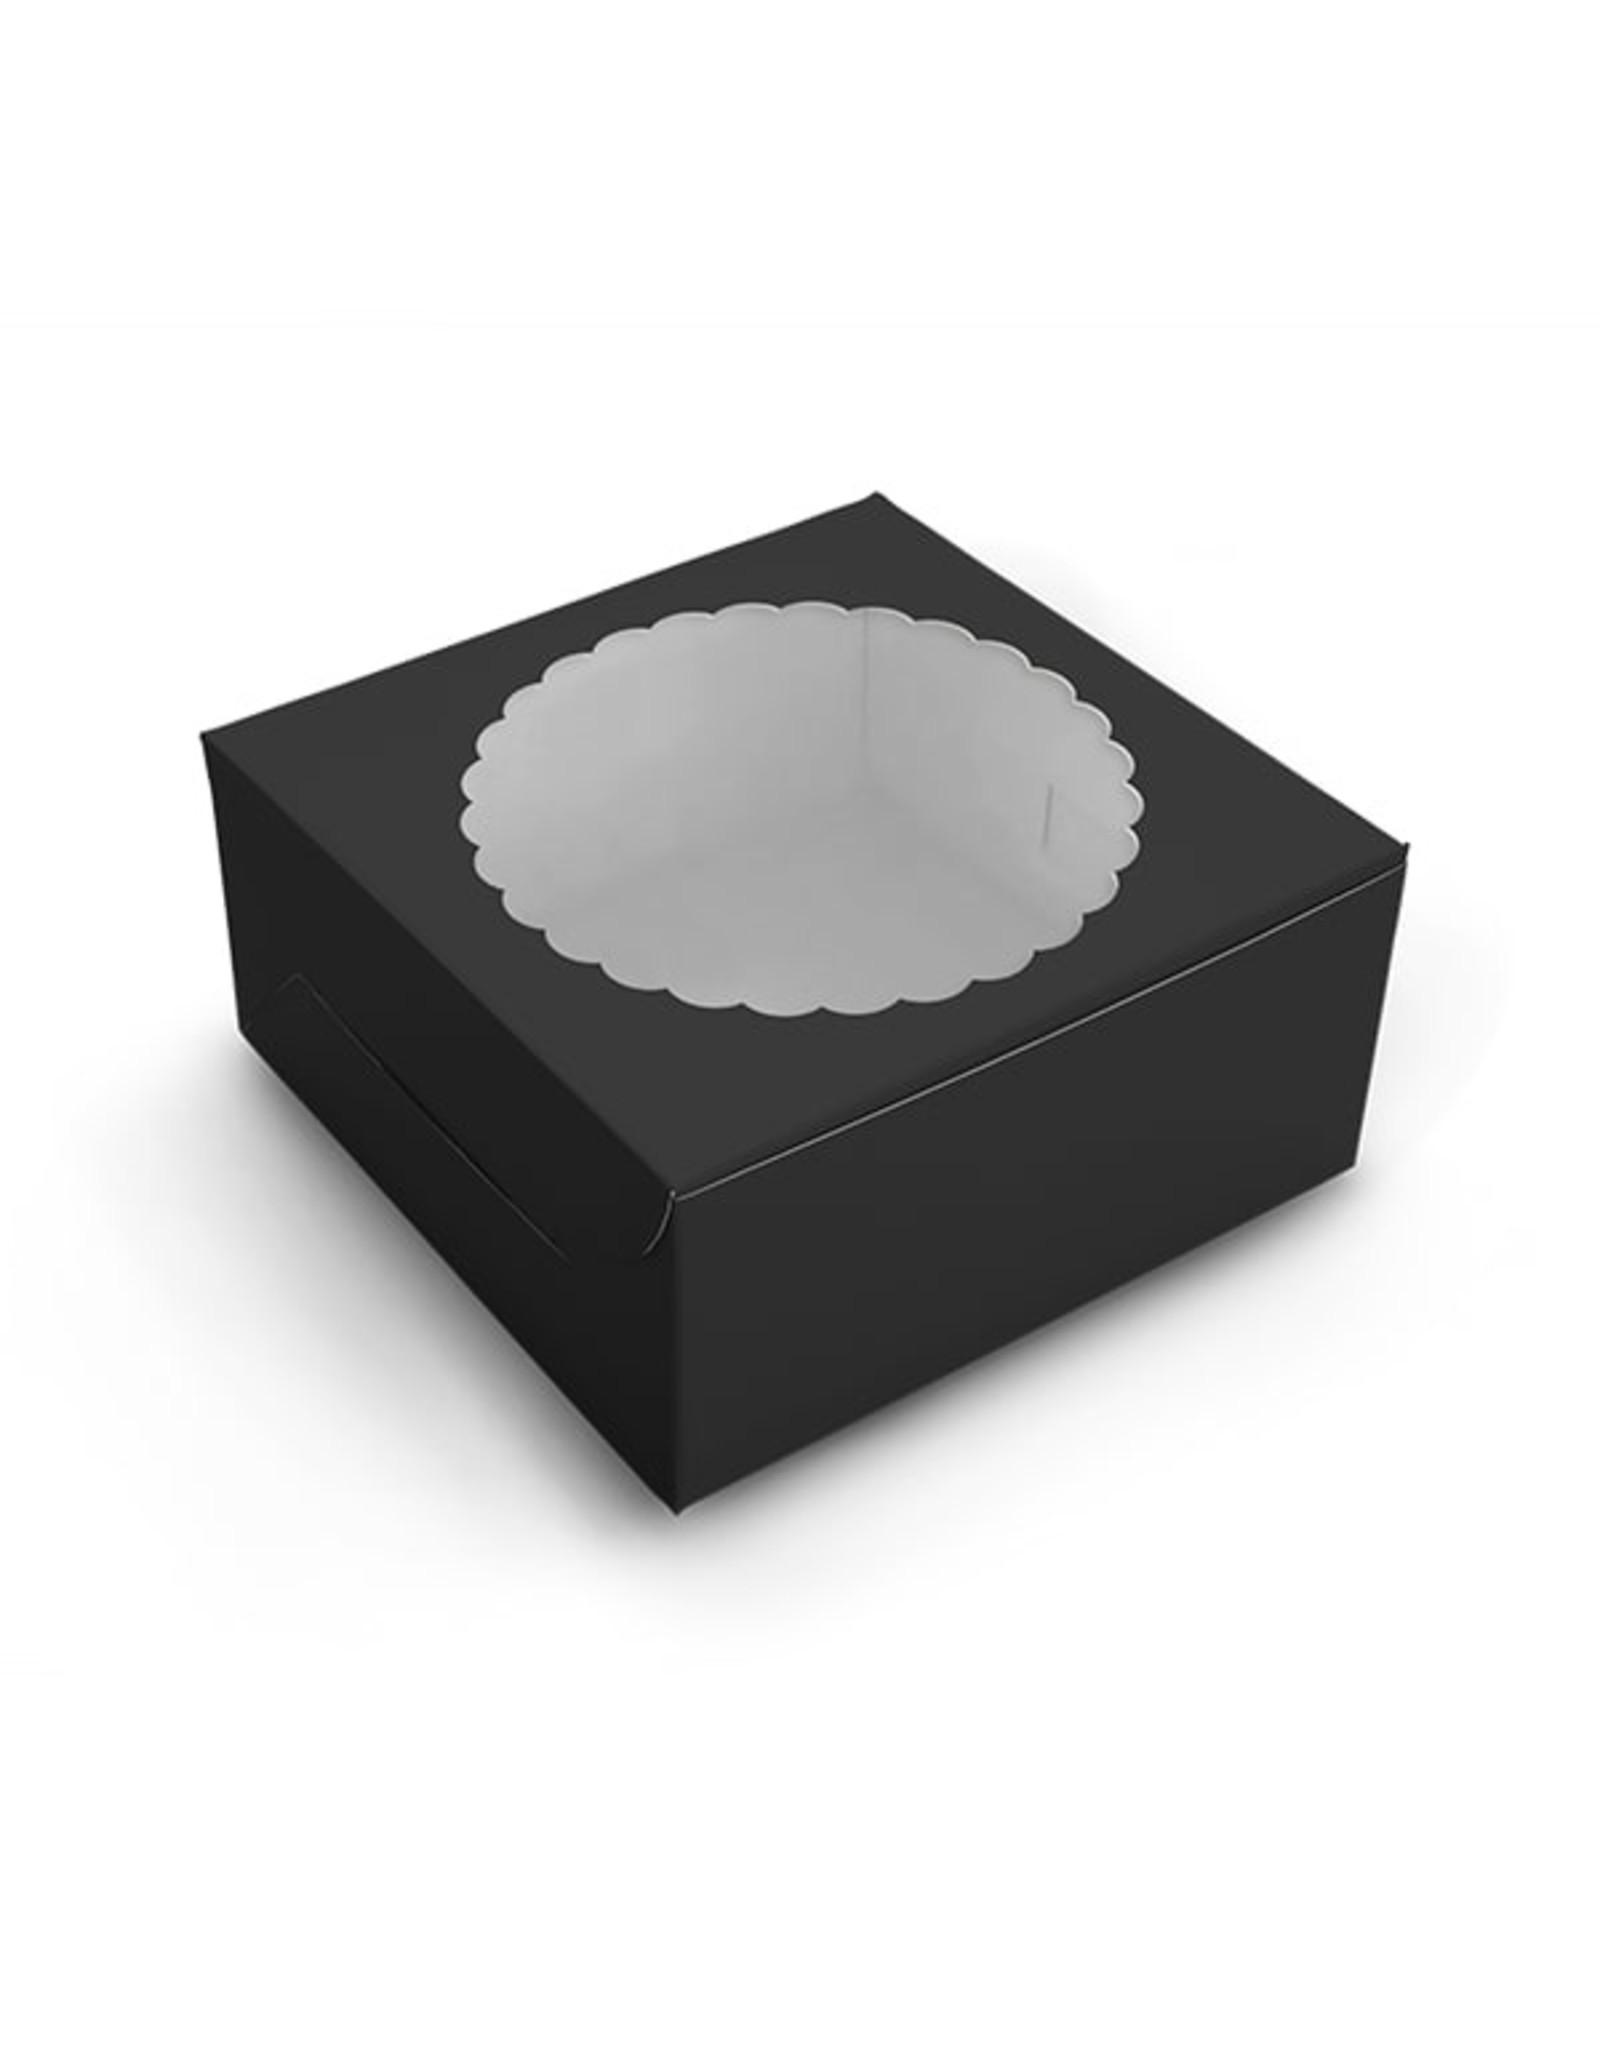 Black window cake box - 203 x 203 x 127 mm (per 10 pieces)